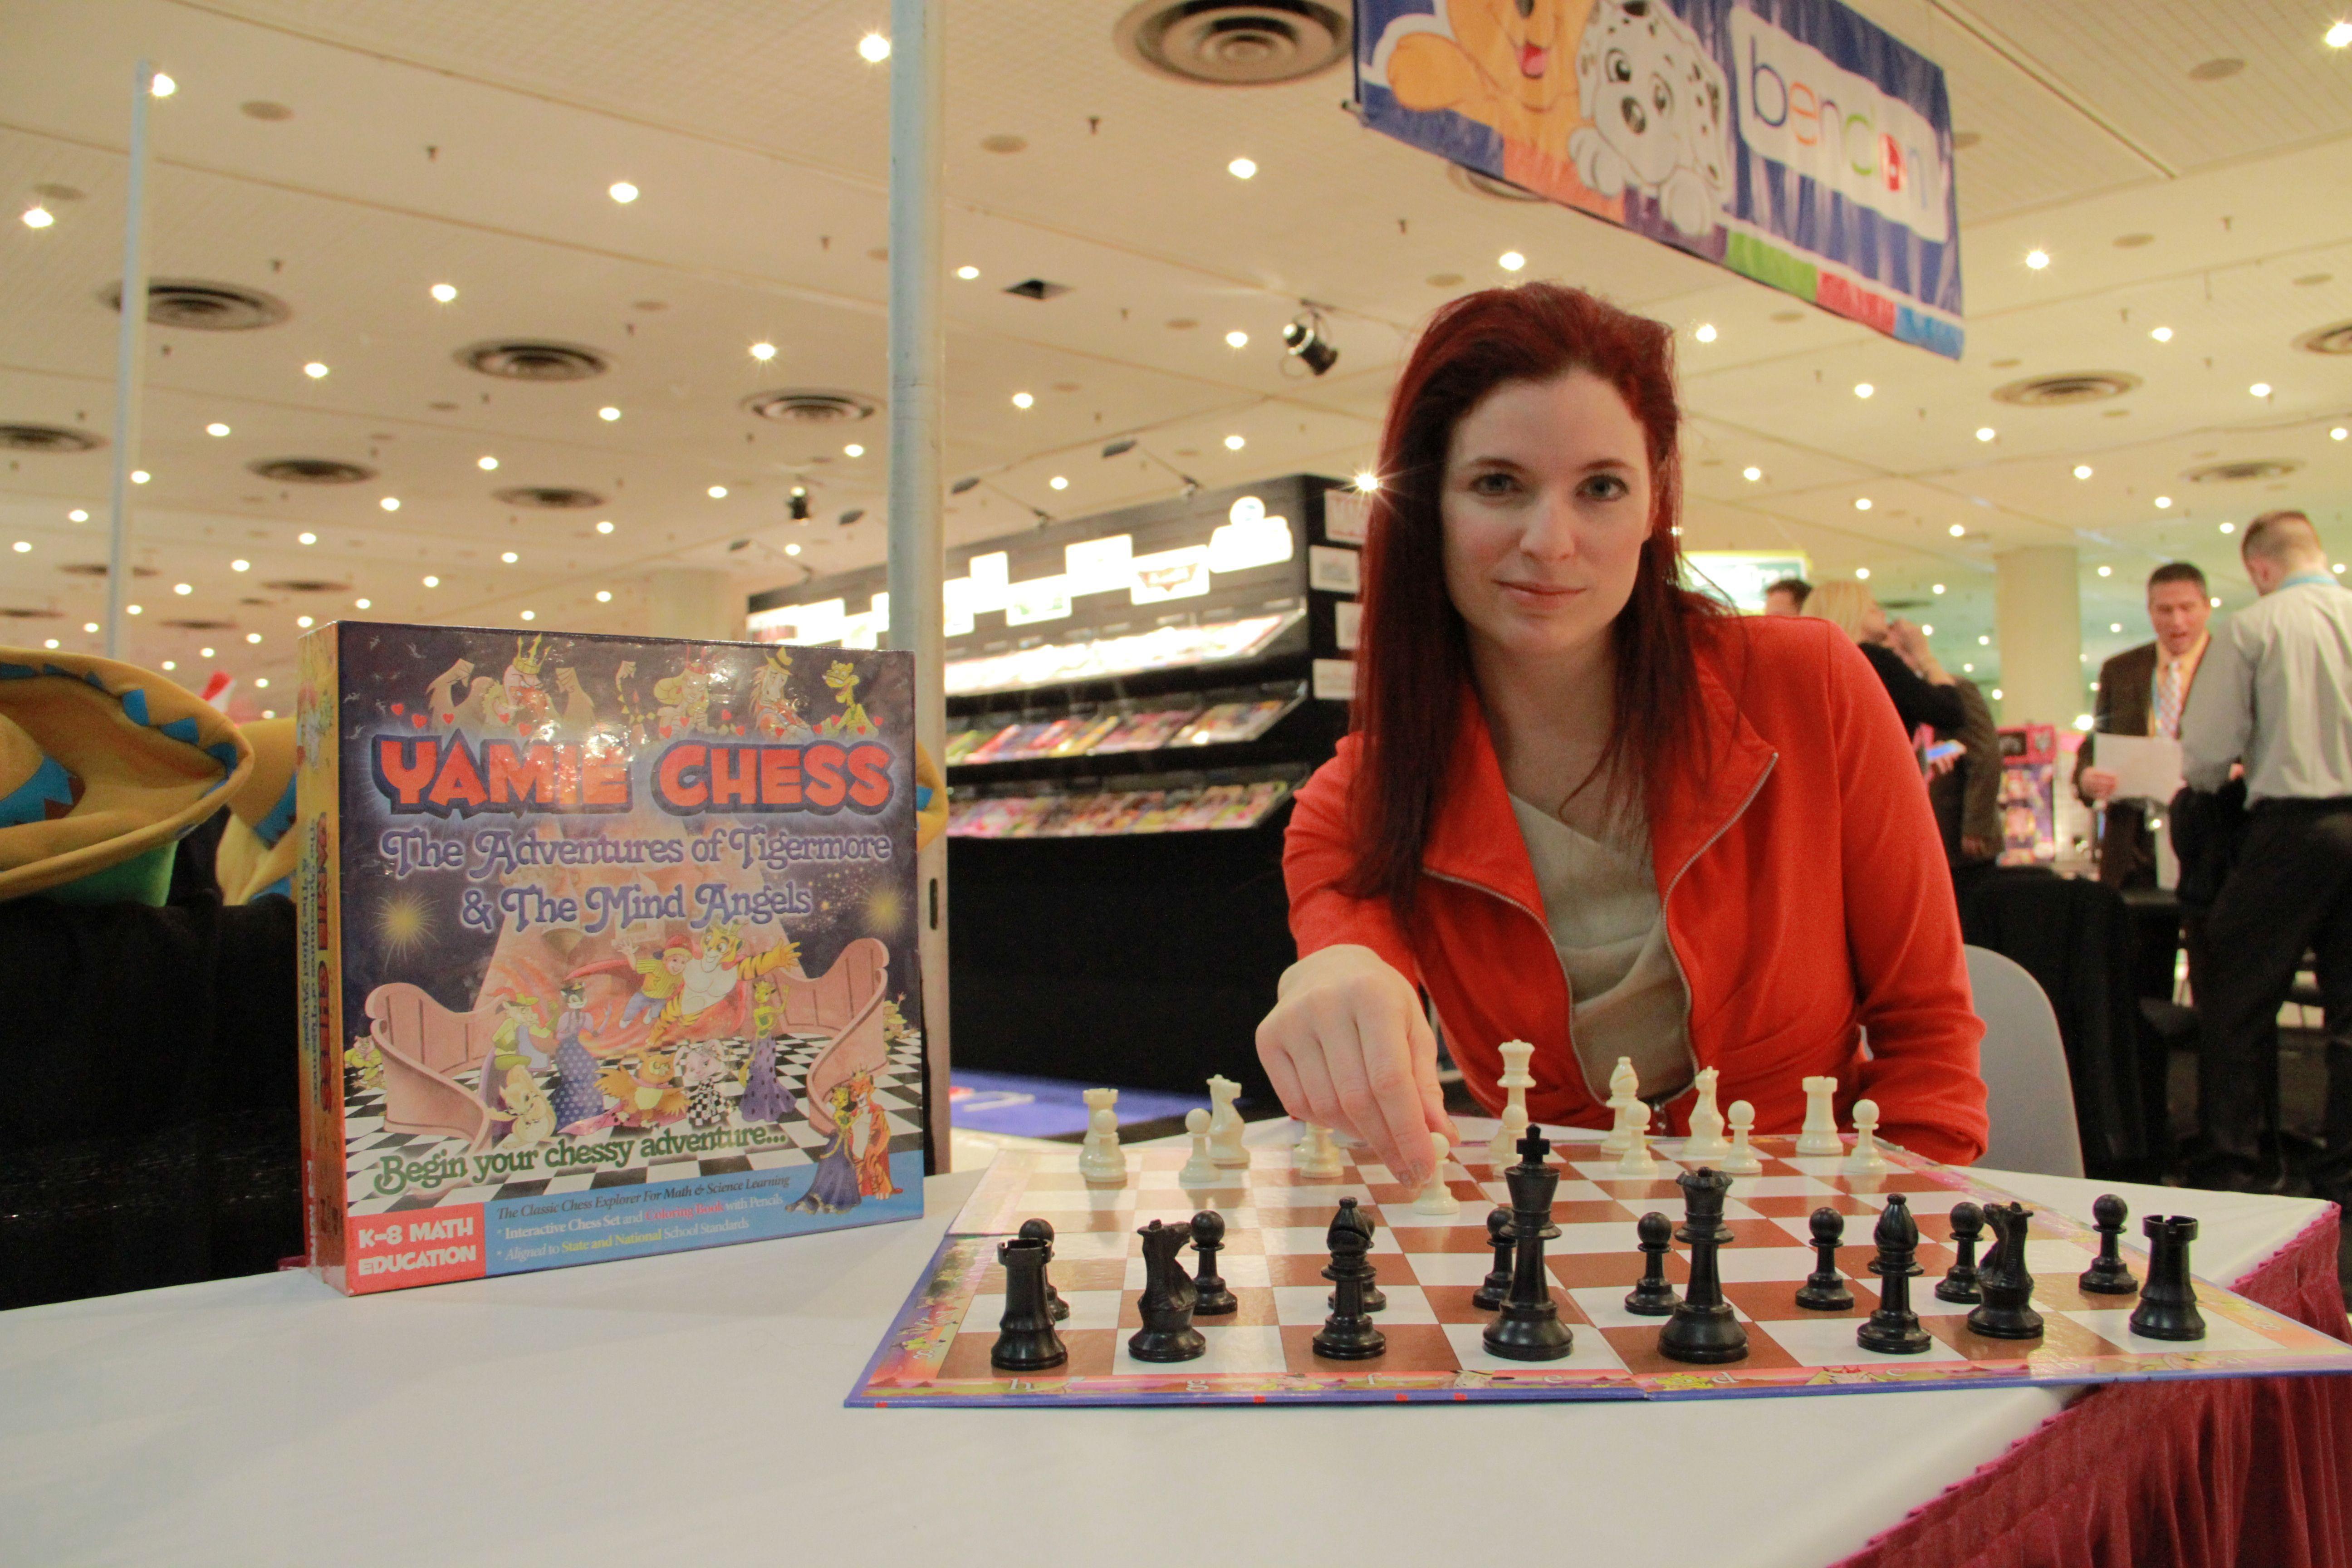 Made in america yamie chess